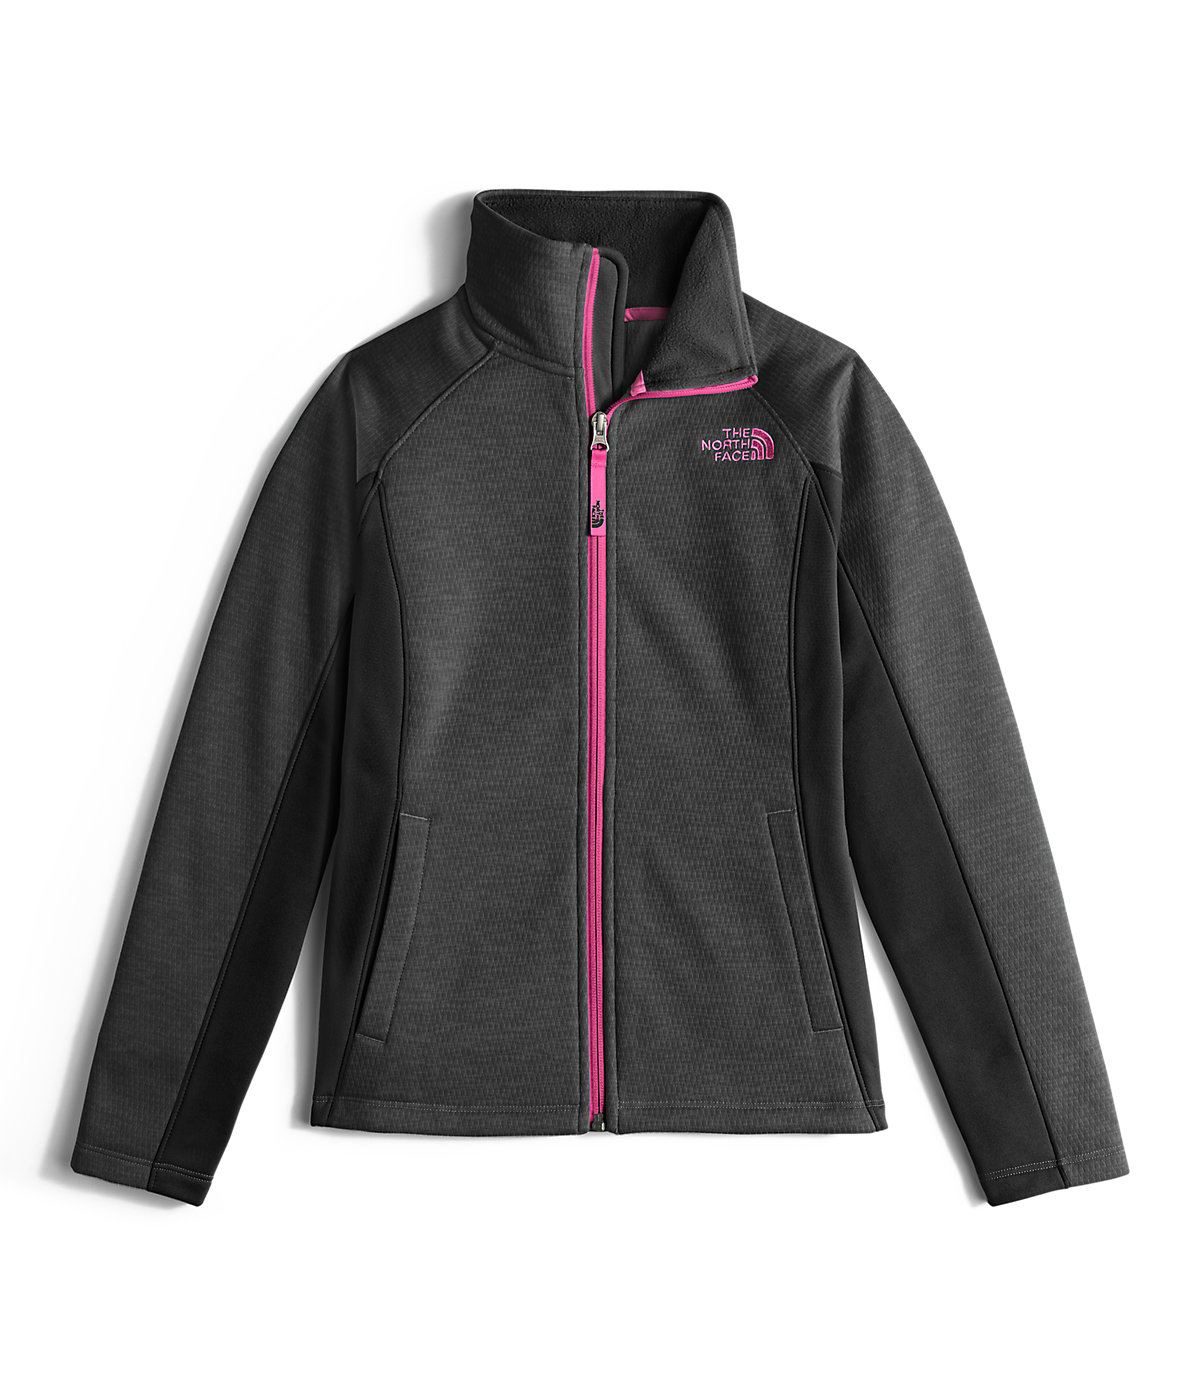 e9d93293f The North Face Girls' Arcata Full Zip Jacket